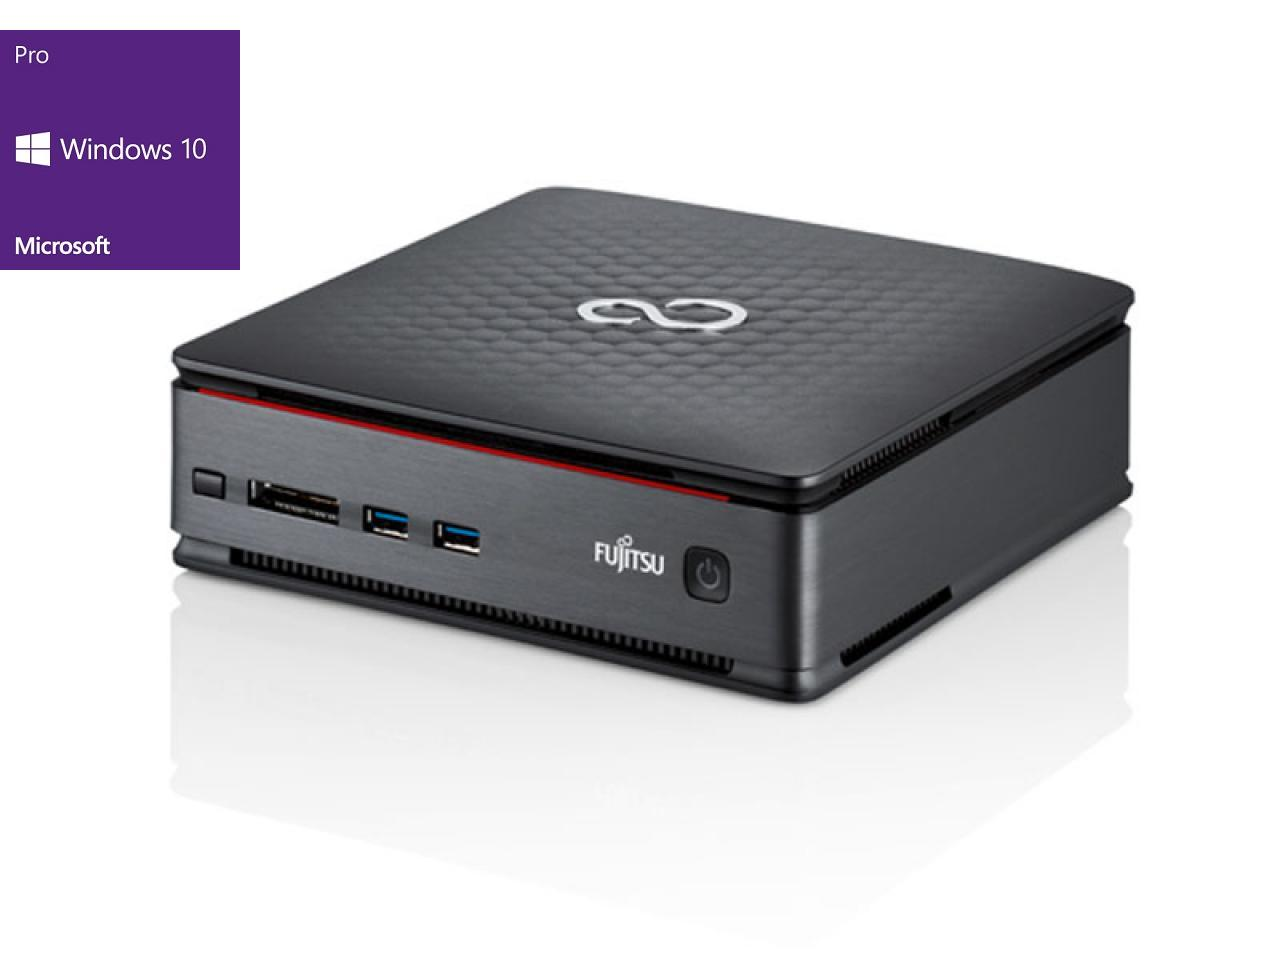 Fujitsu ESPRIMO Q920 MP  - shop.bb-net.de